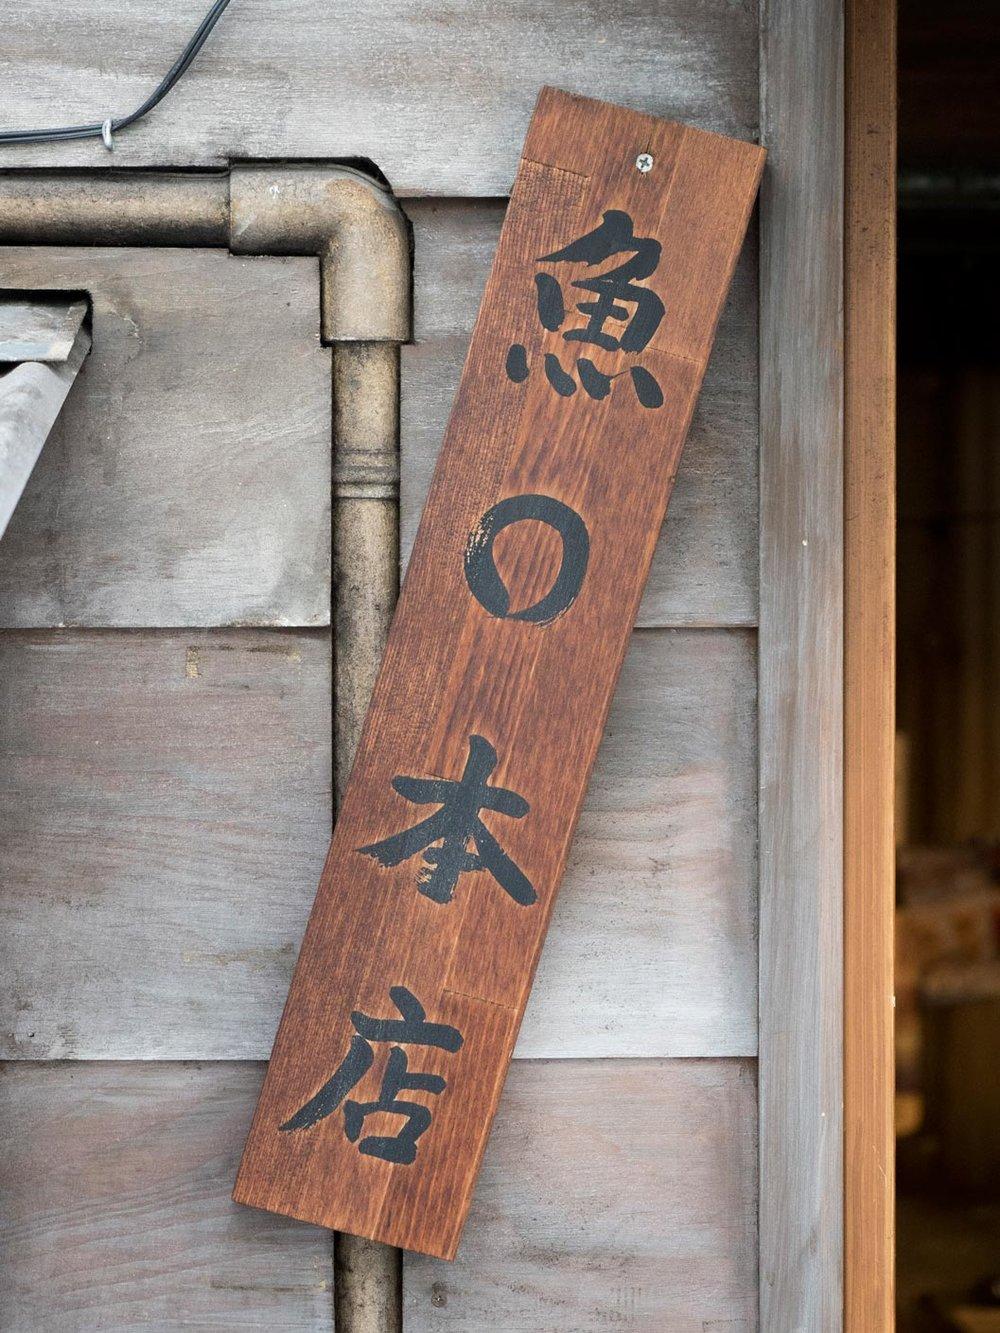 2017-09-03-jp-tokyo-ginza-signboard-05.jpg